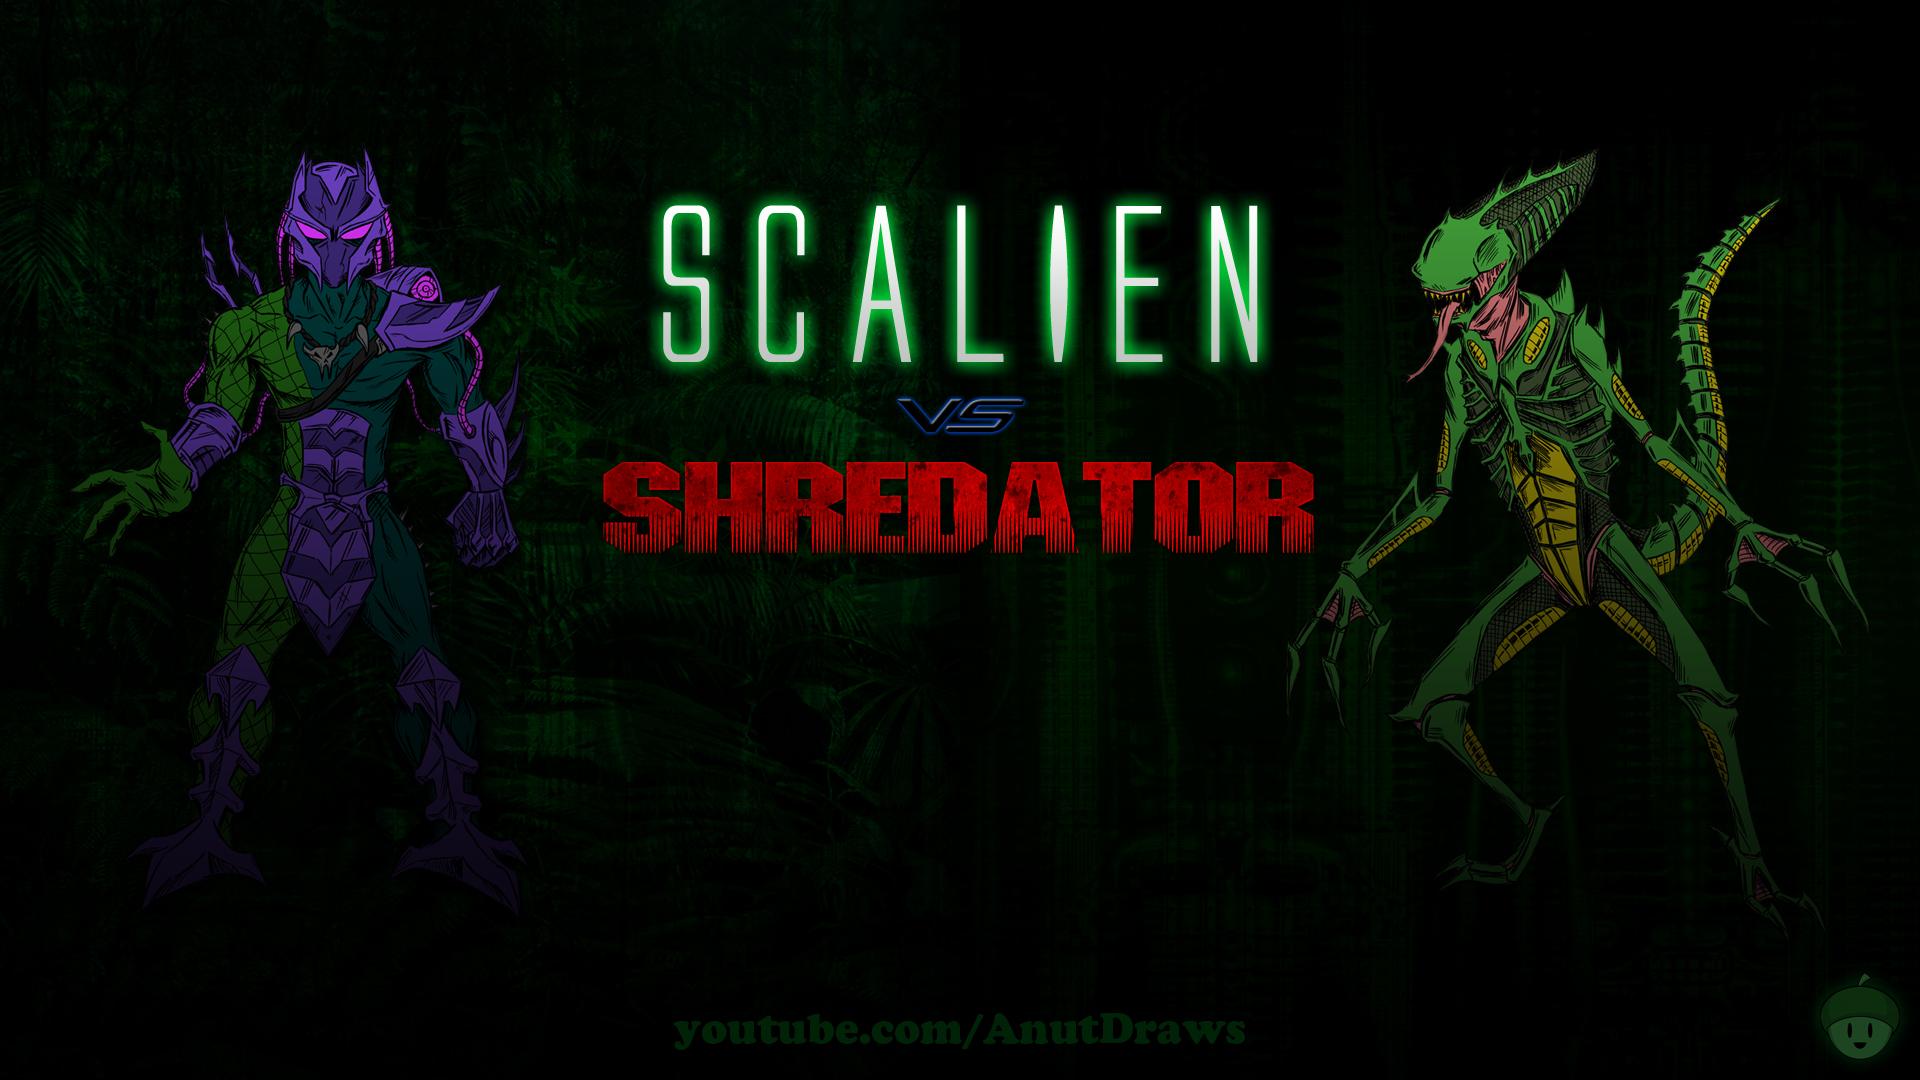 Scalien Vs. Shredator by AnutDraws